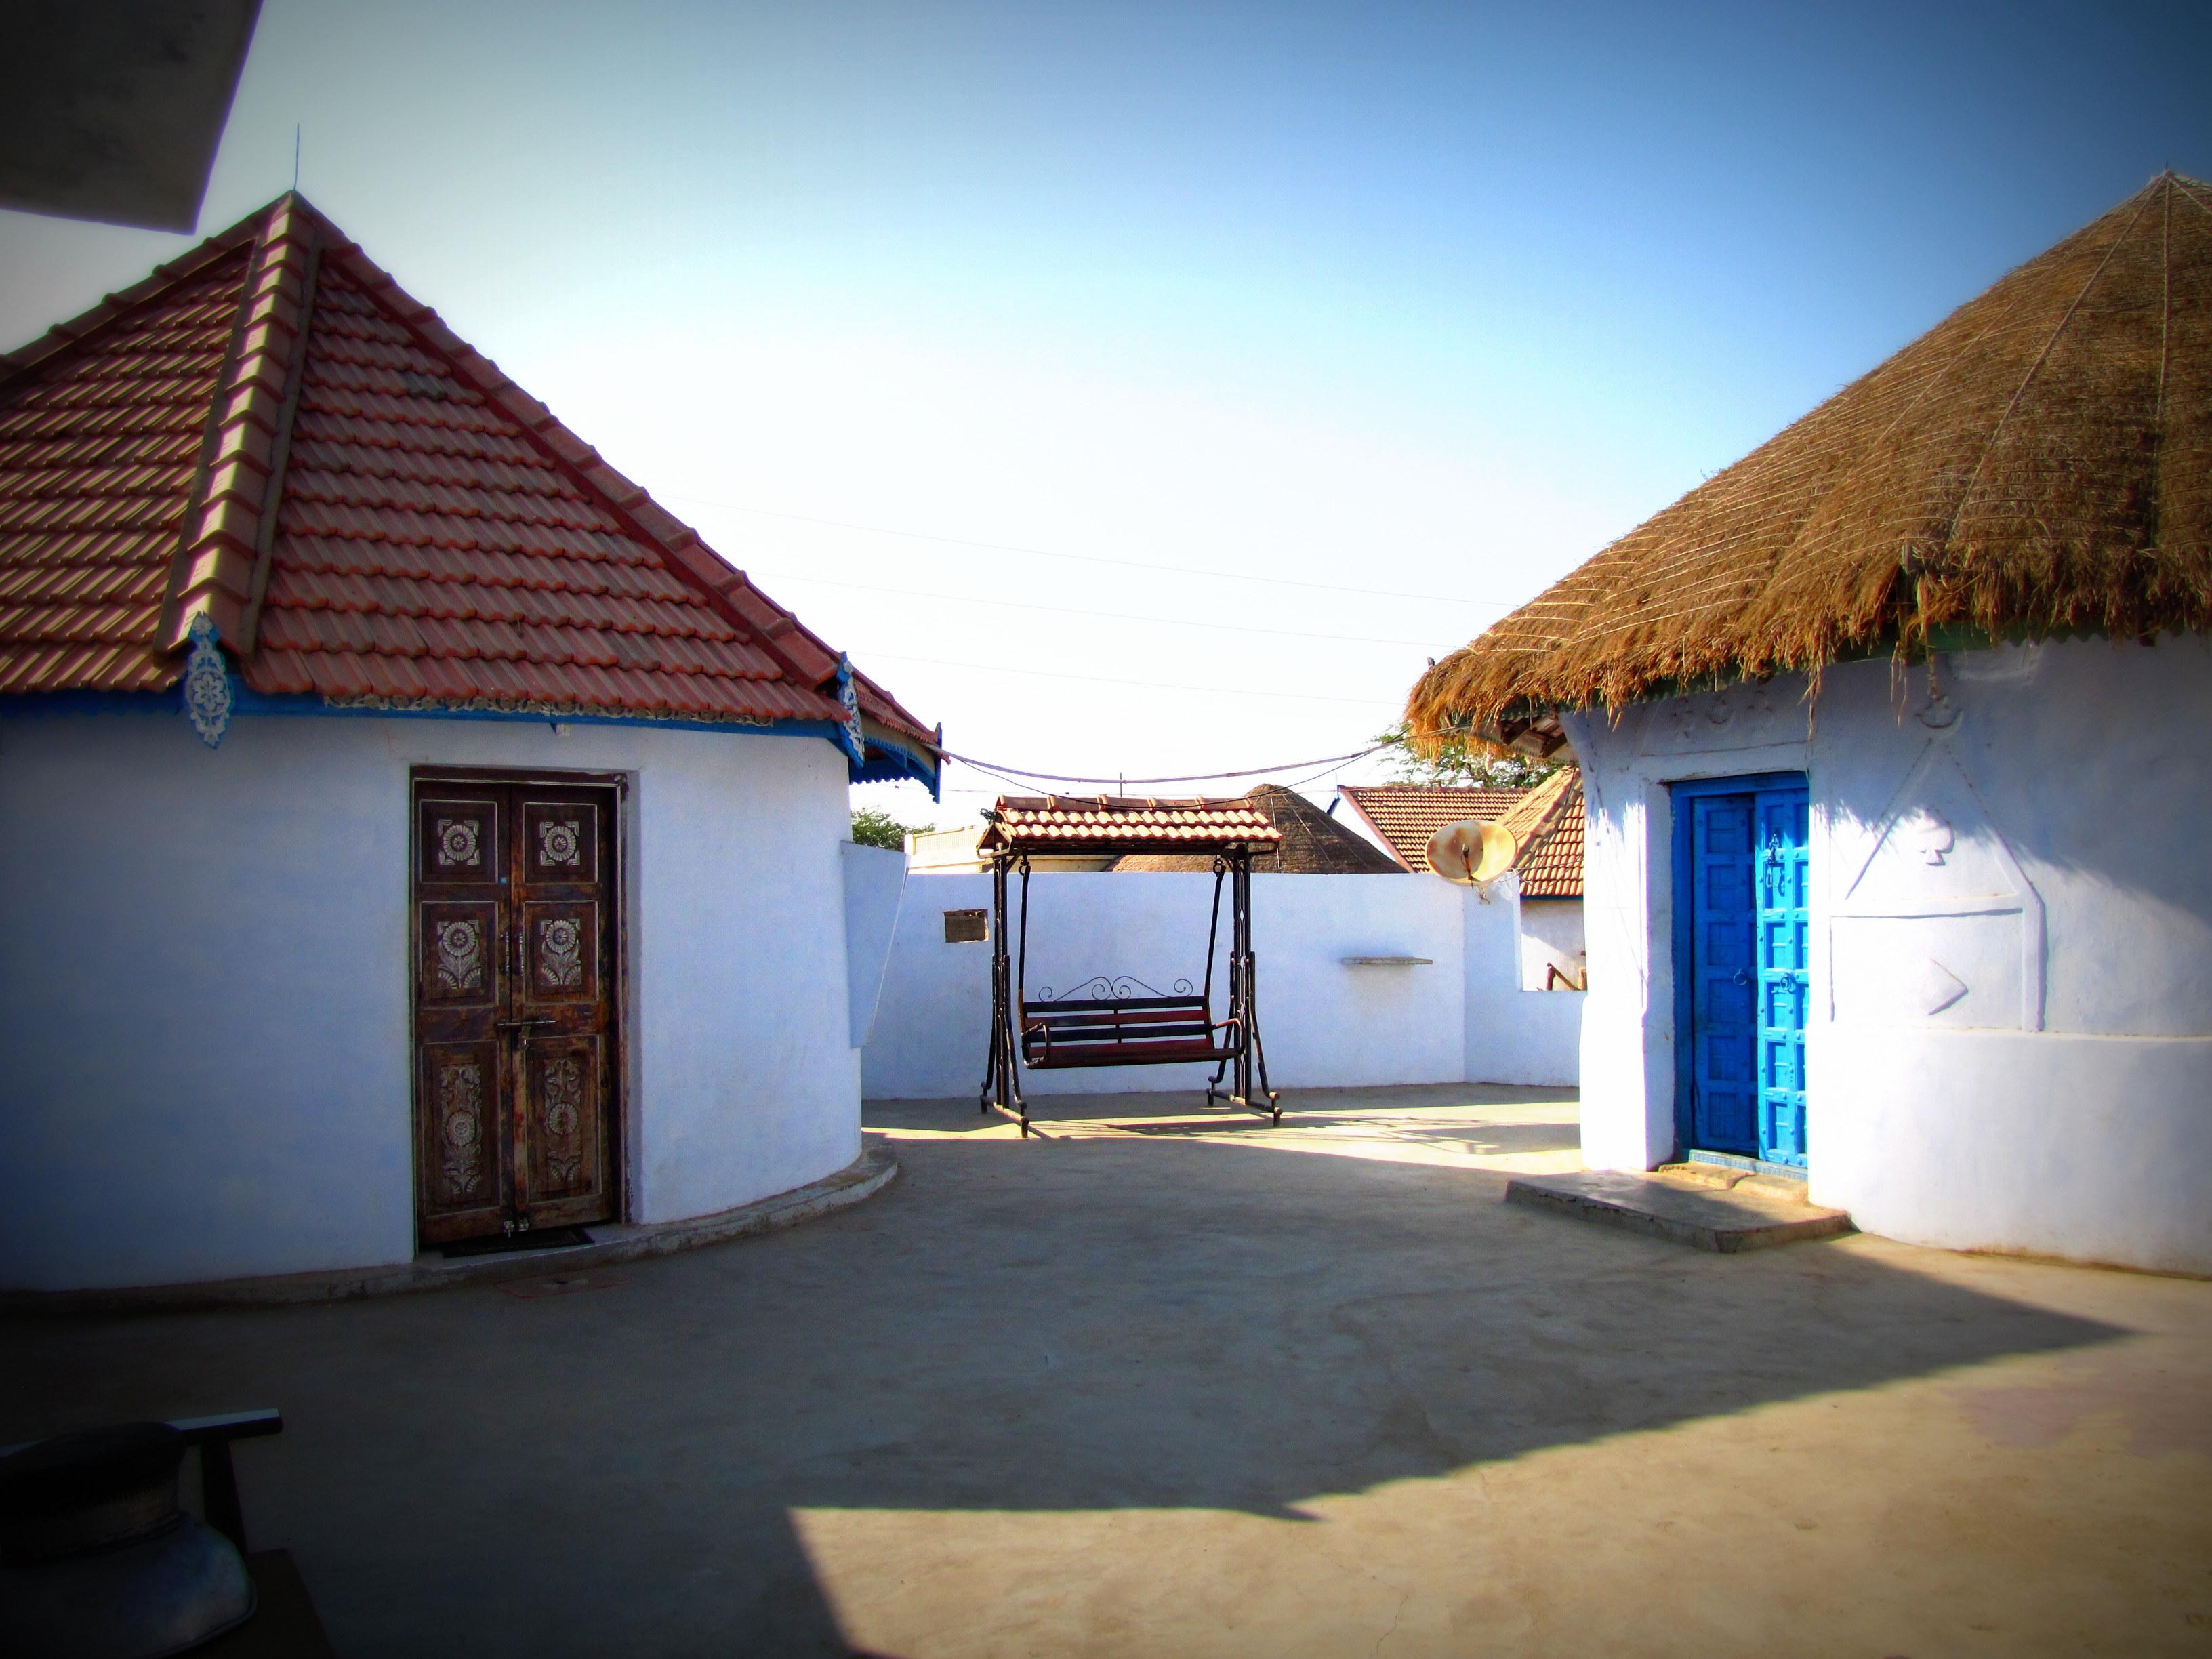 Bhungas or Mud Houses of Dhodro Village